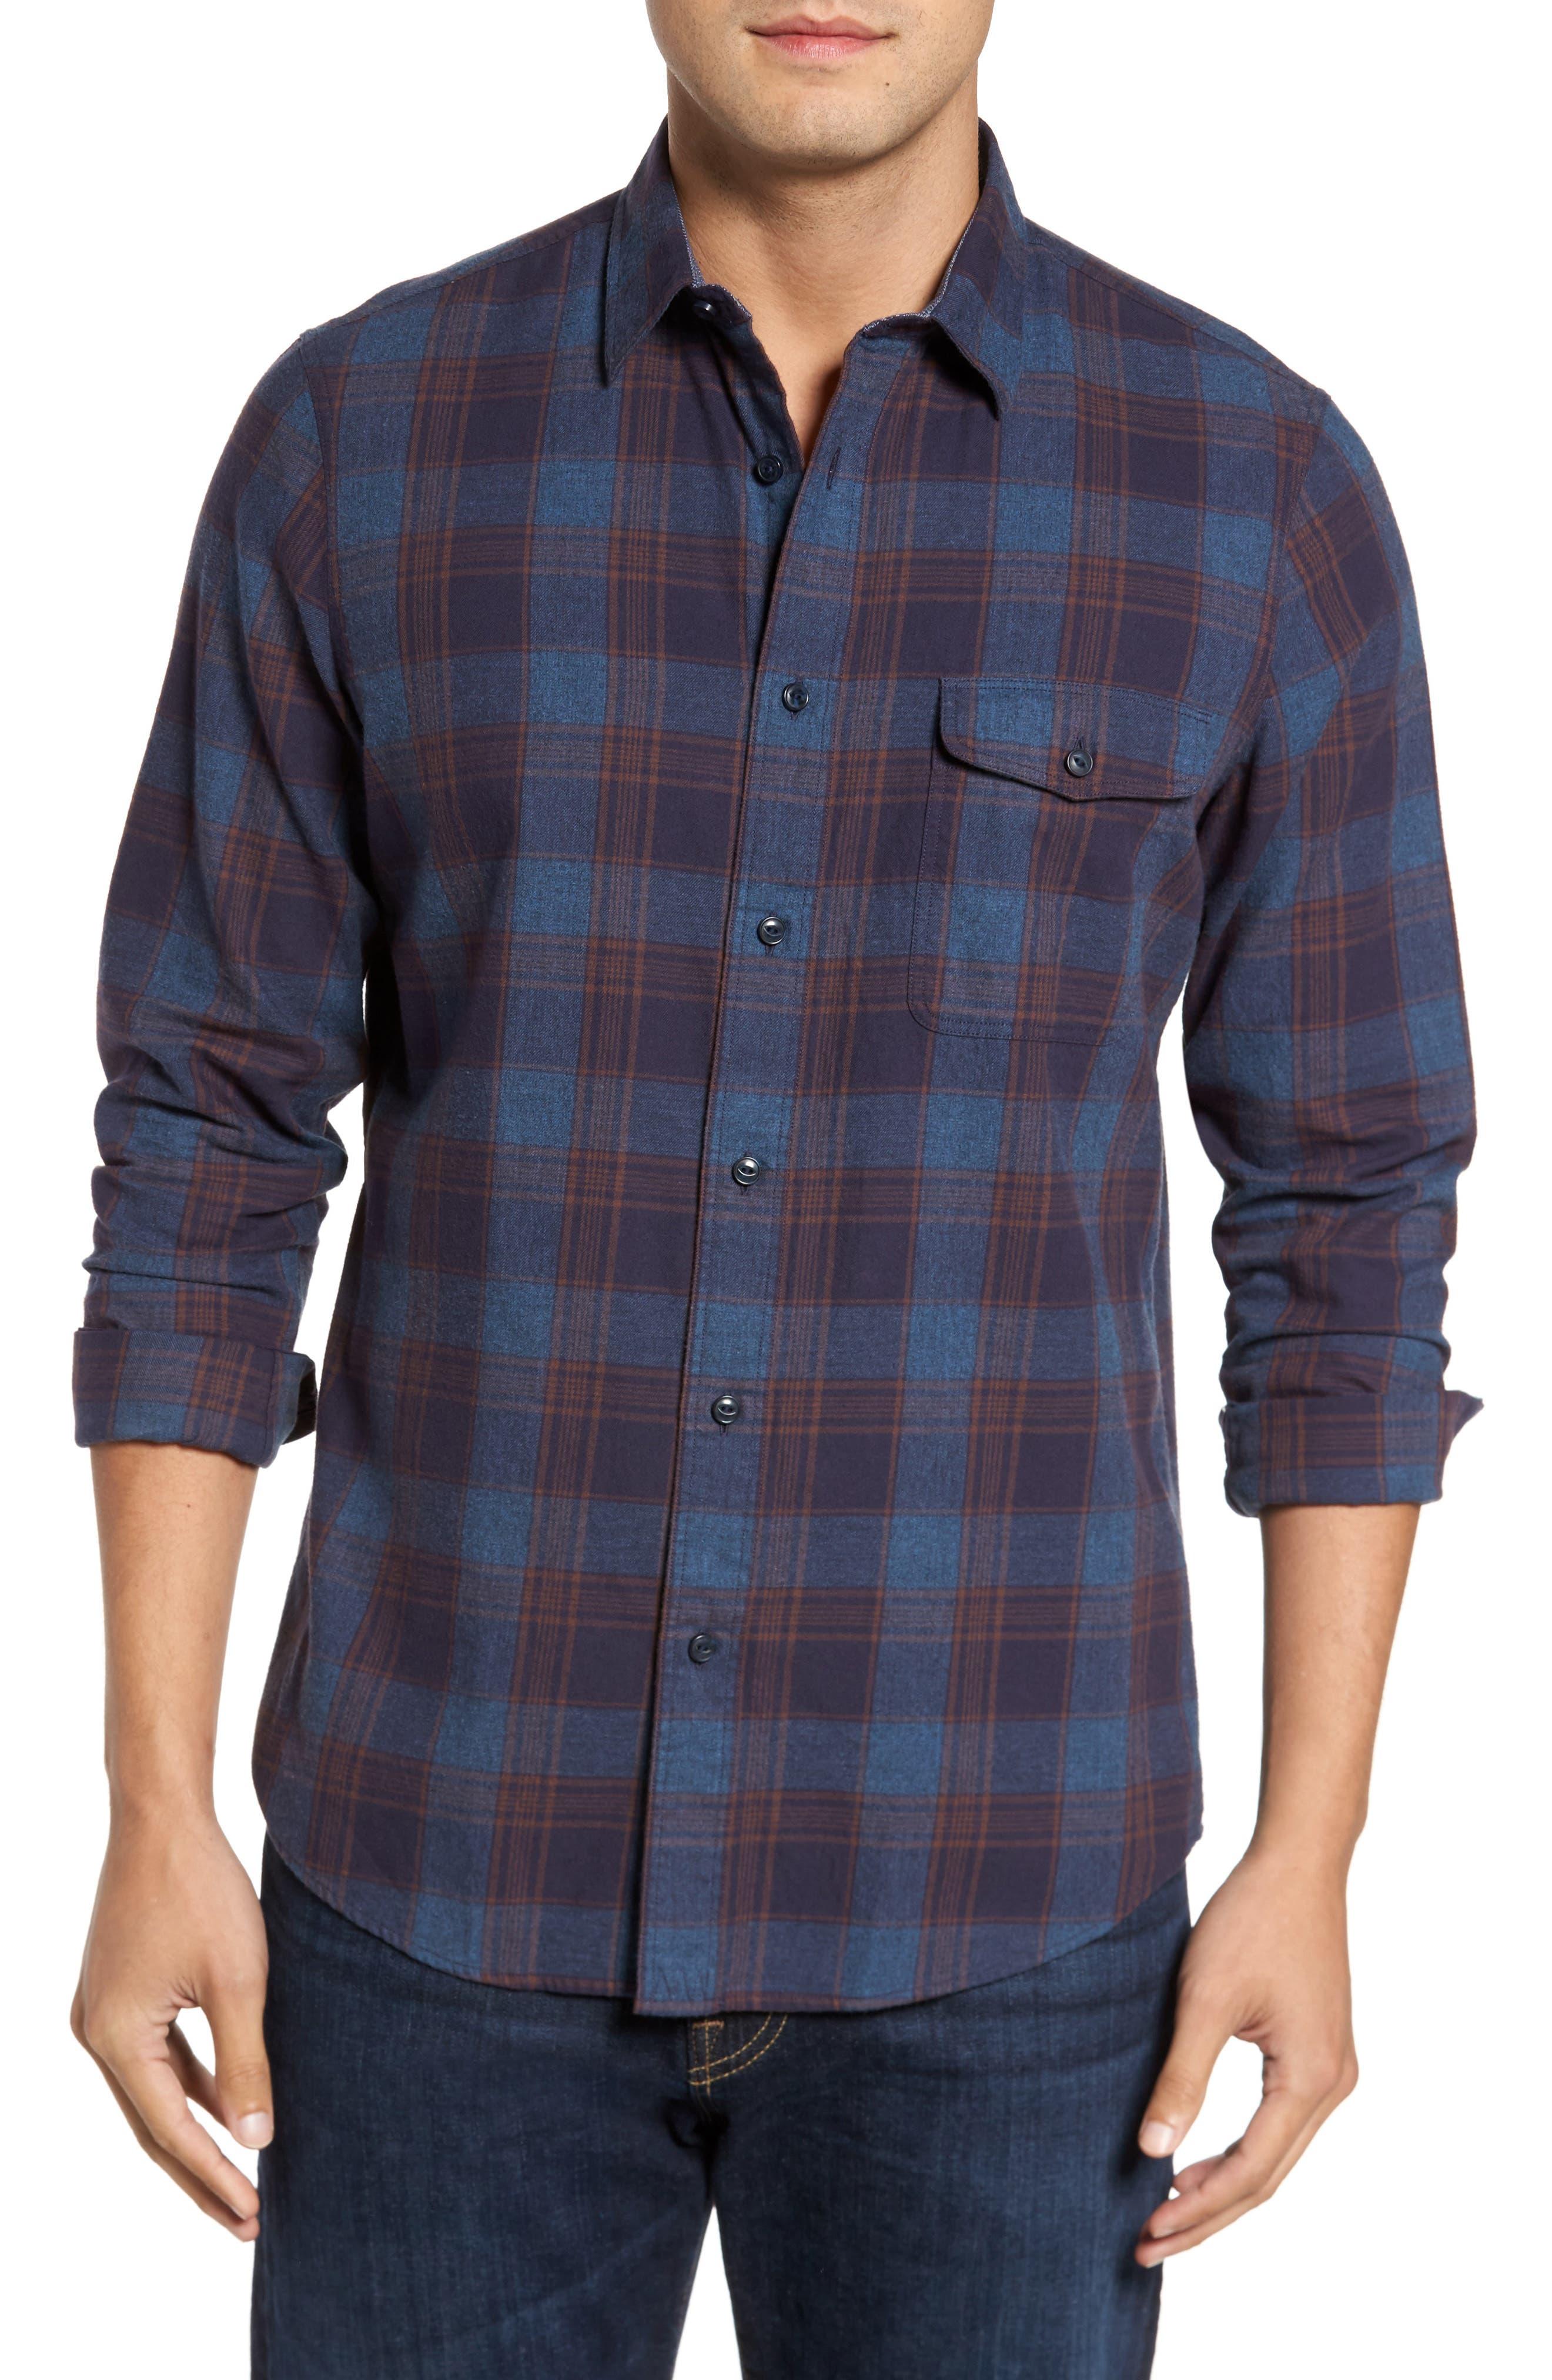 Regular Fit Lumber Check Flannel Shirt,                             Main thumbnail 1, color,                             401